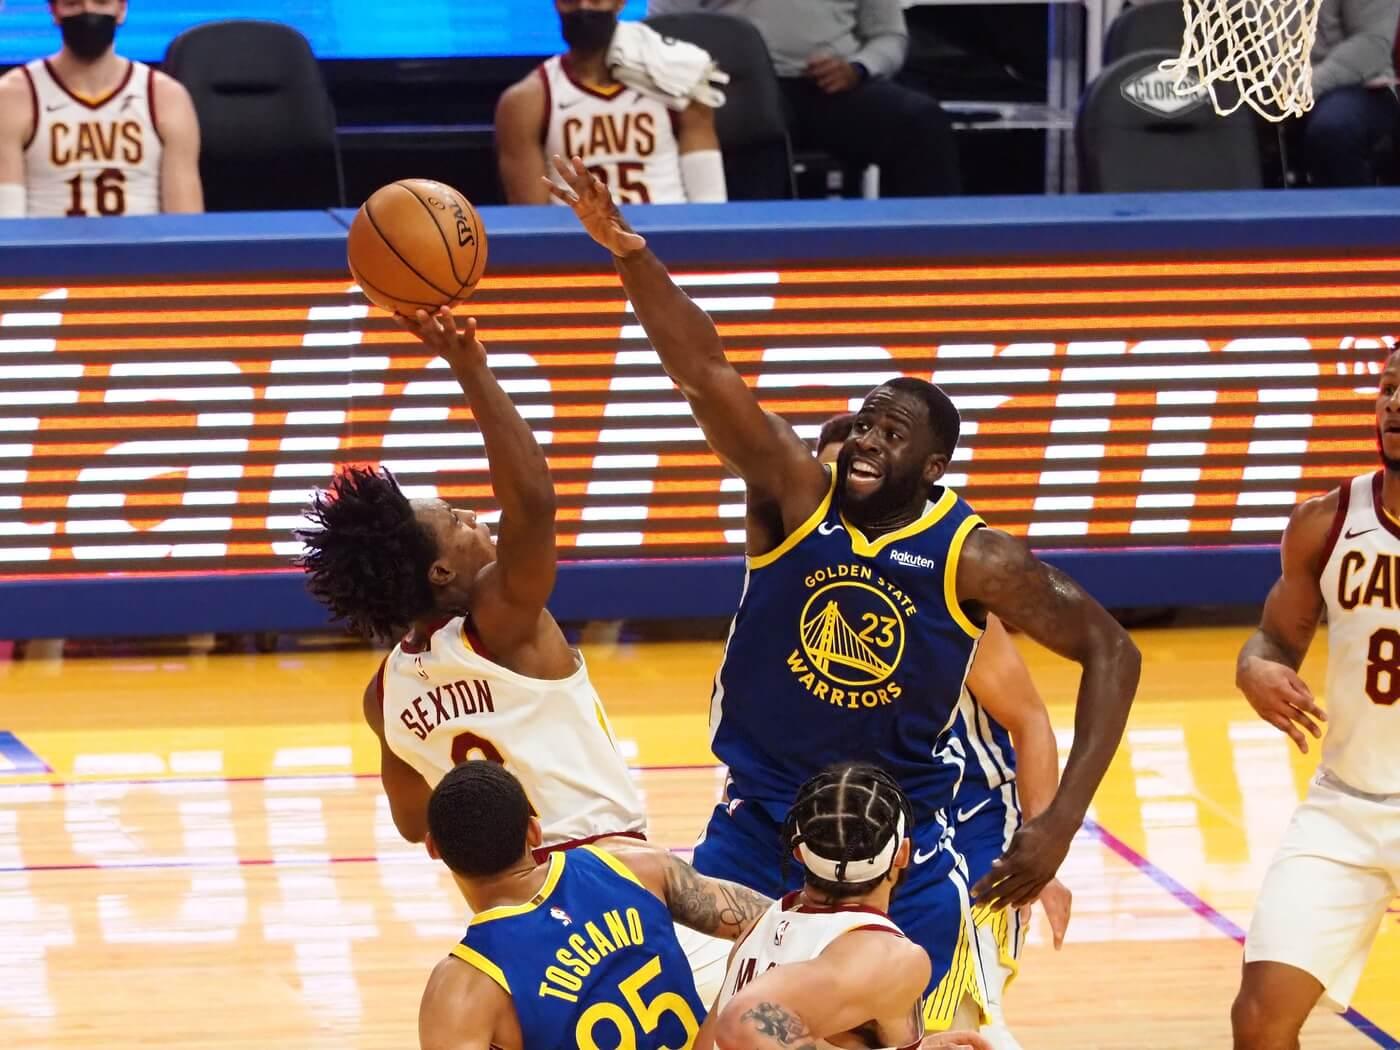 Draymond Green Blasts NBA for Poor Player Treatment